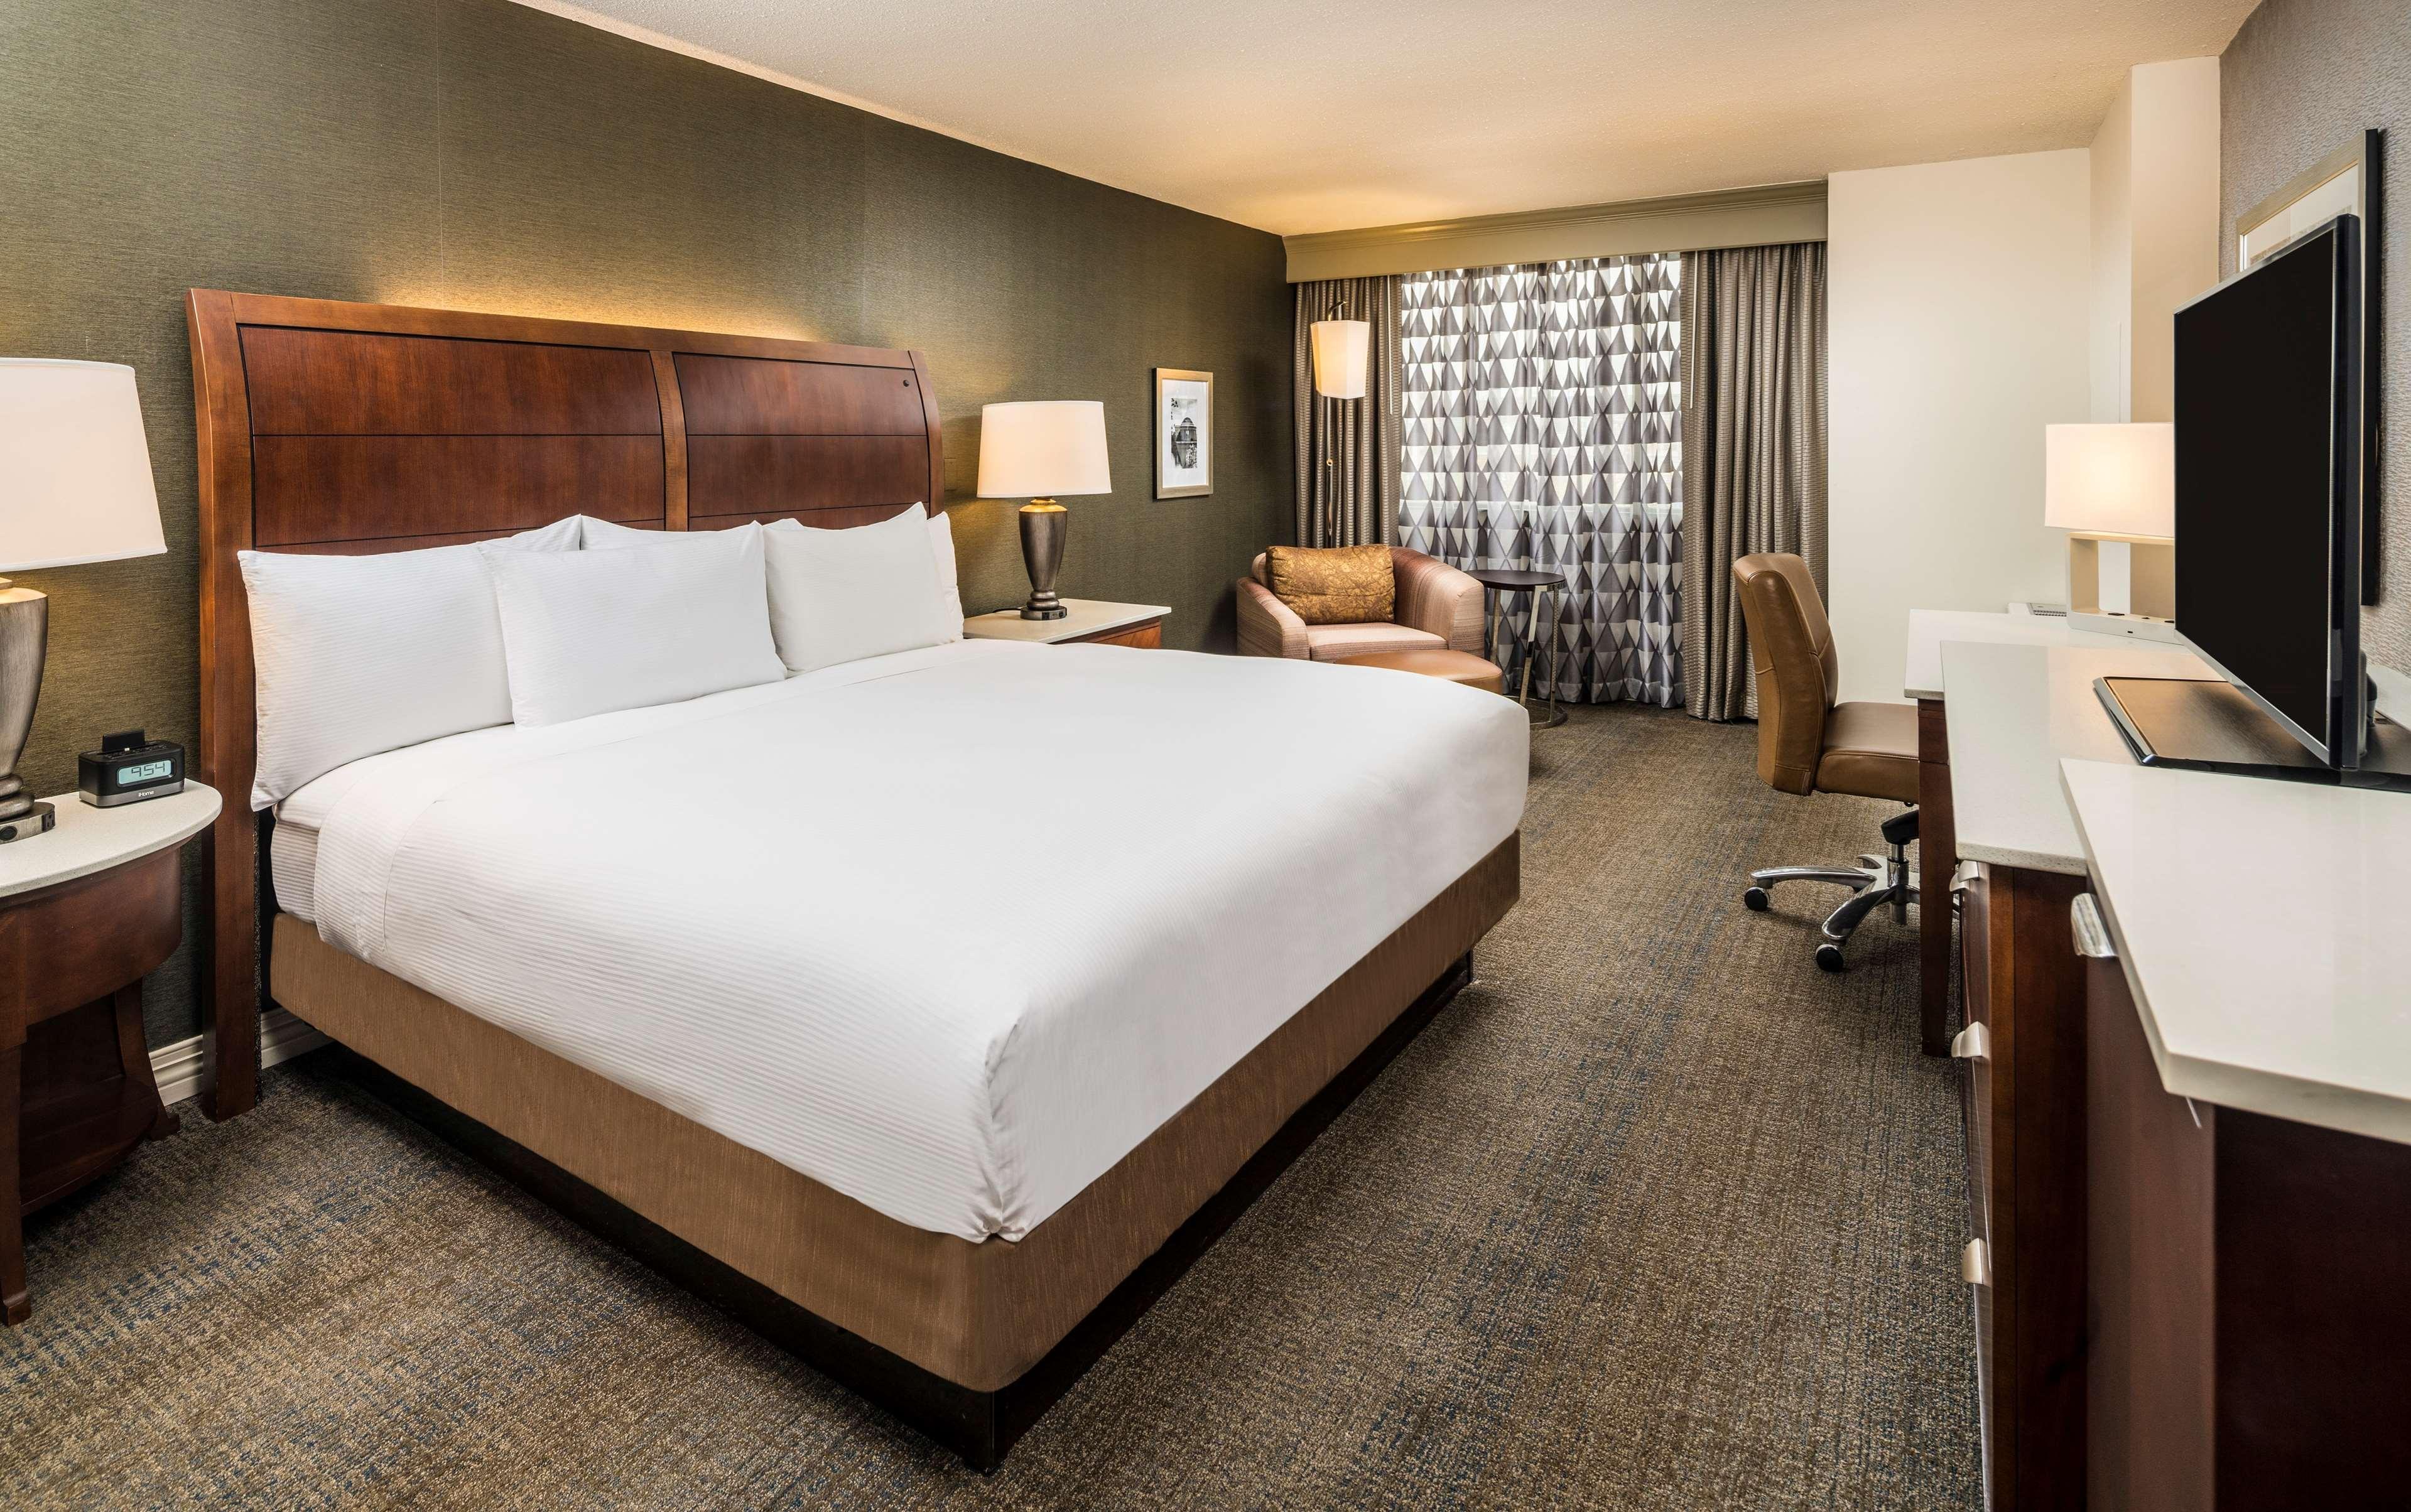 Hilton Washington DC/Rockville Hotel & Executive Meeting Ctr image 35